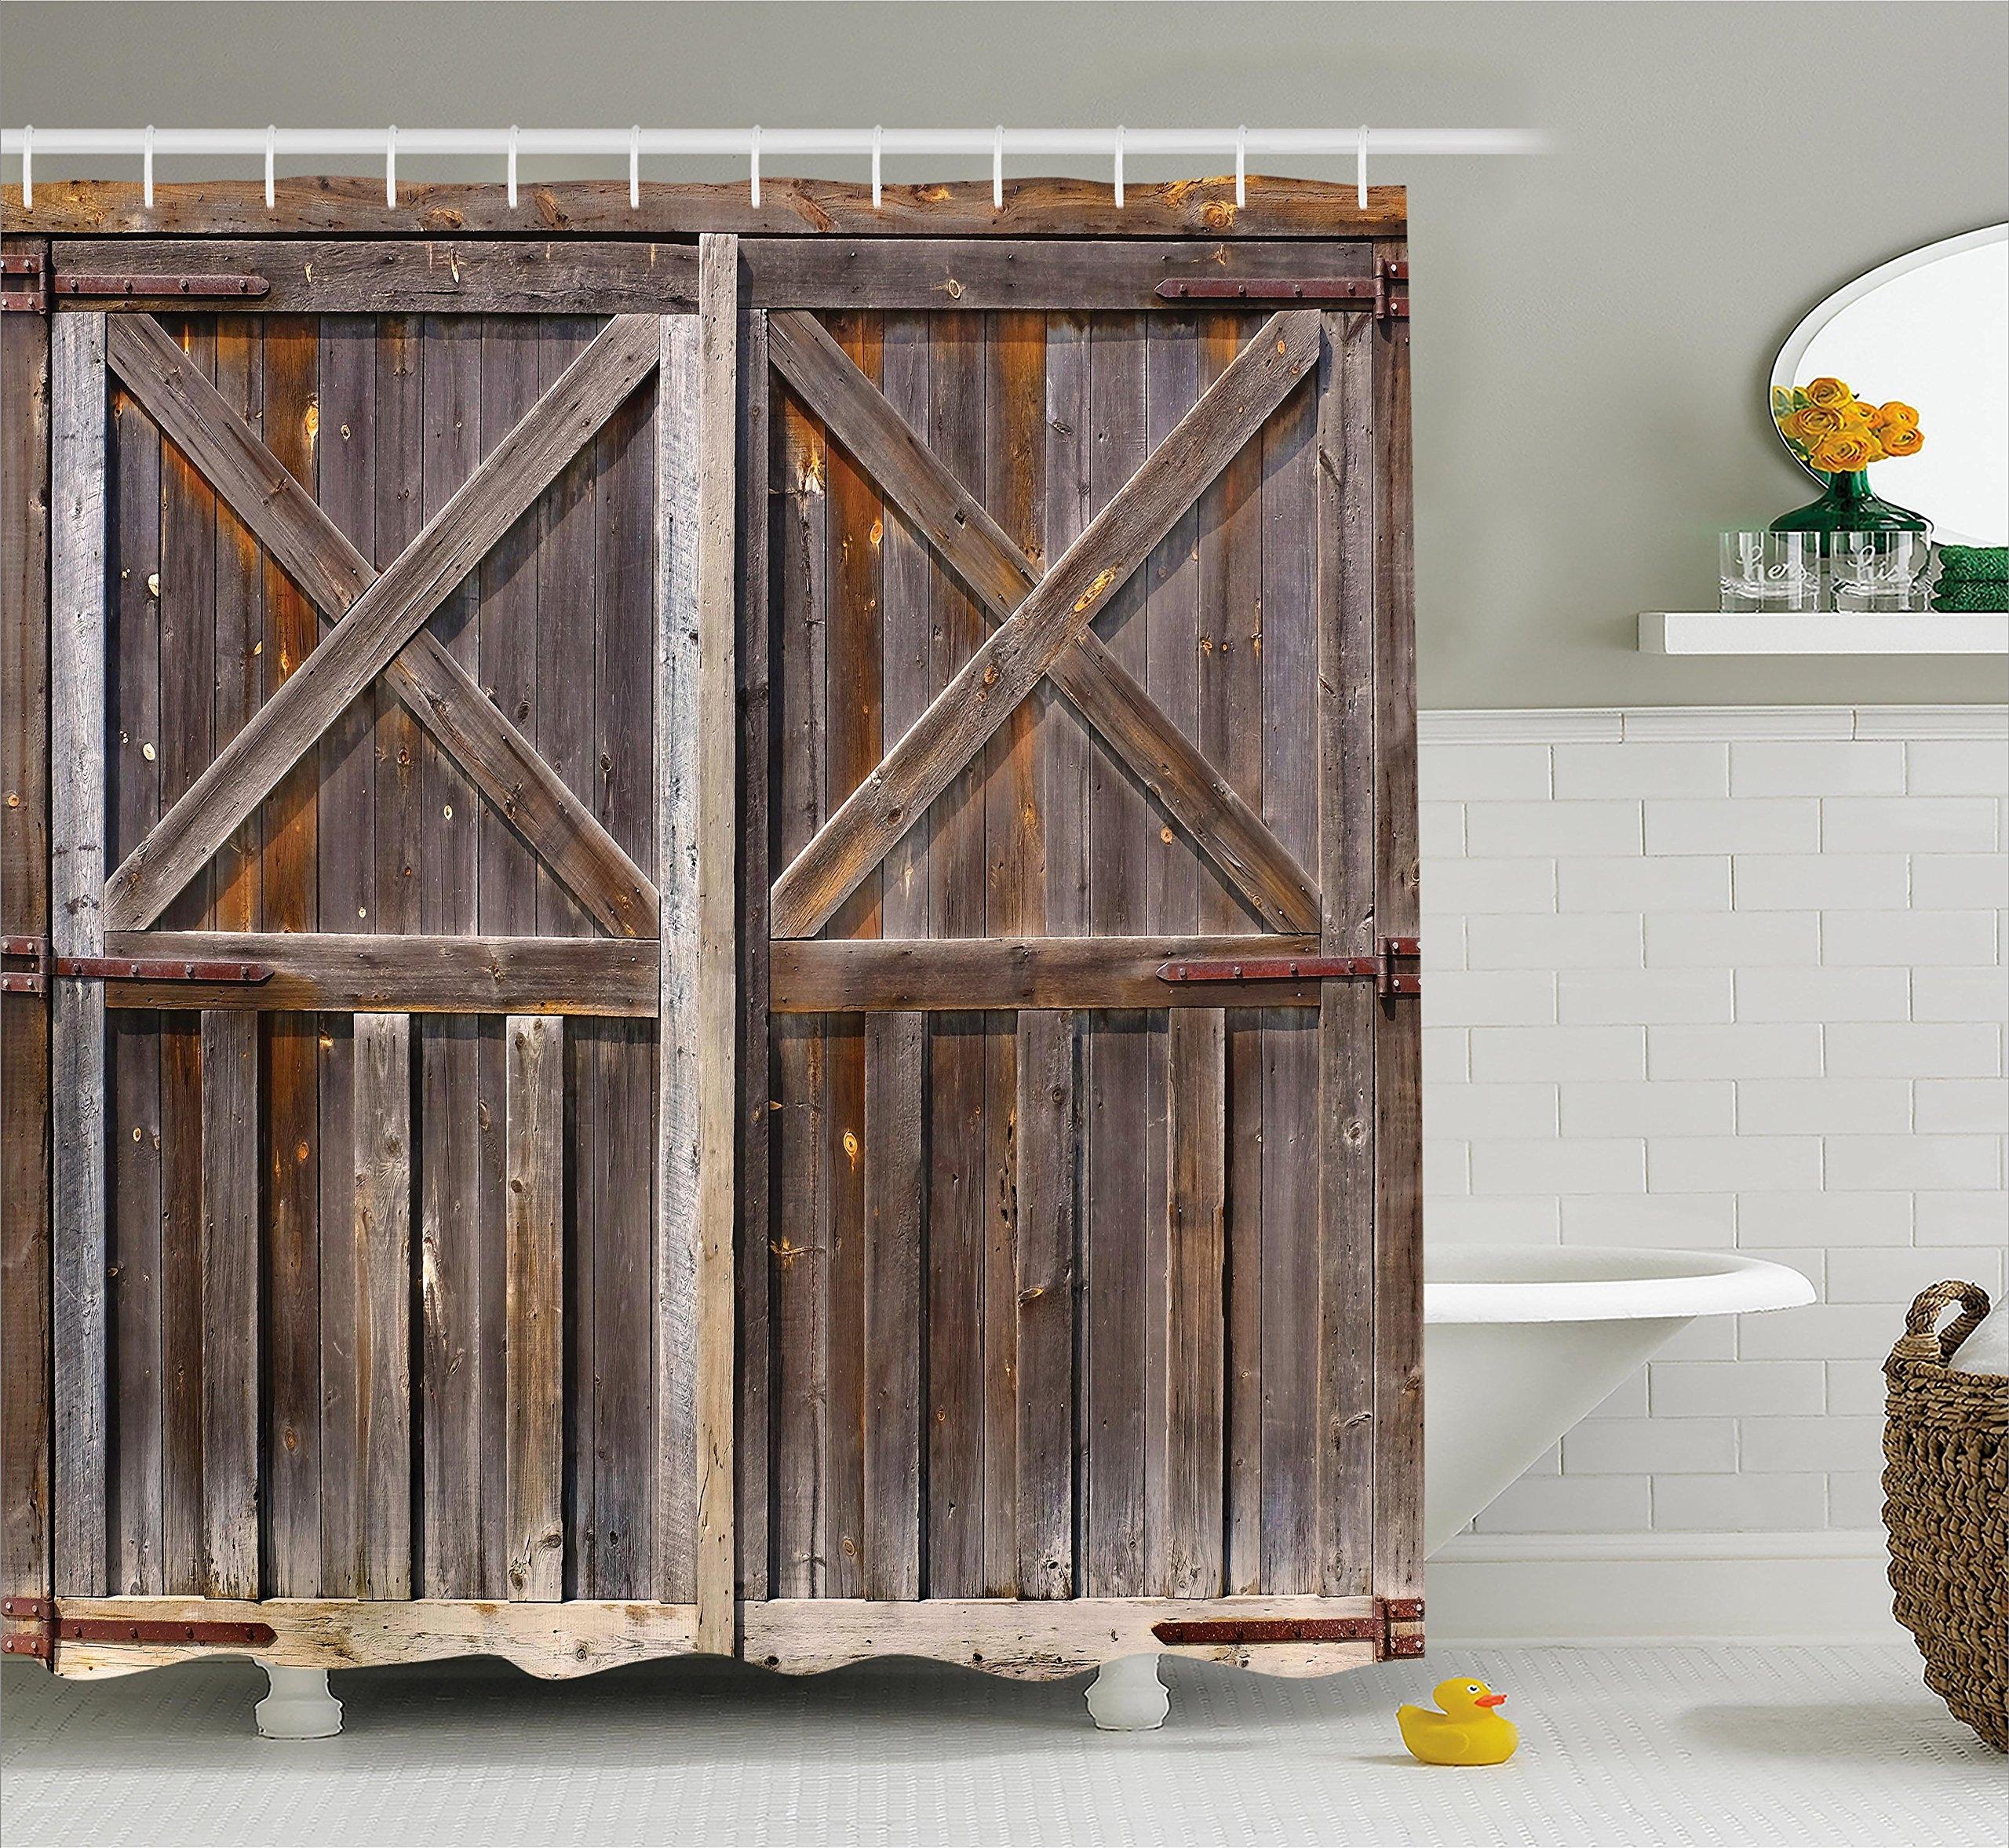 barn door shower curtain you ll love in